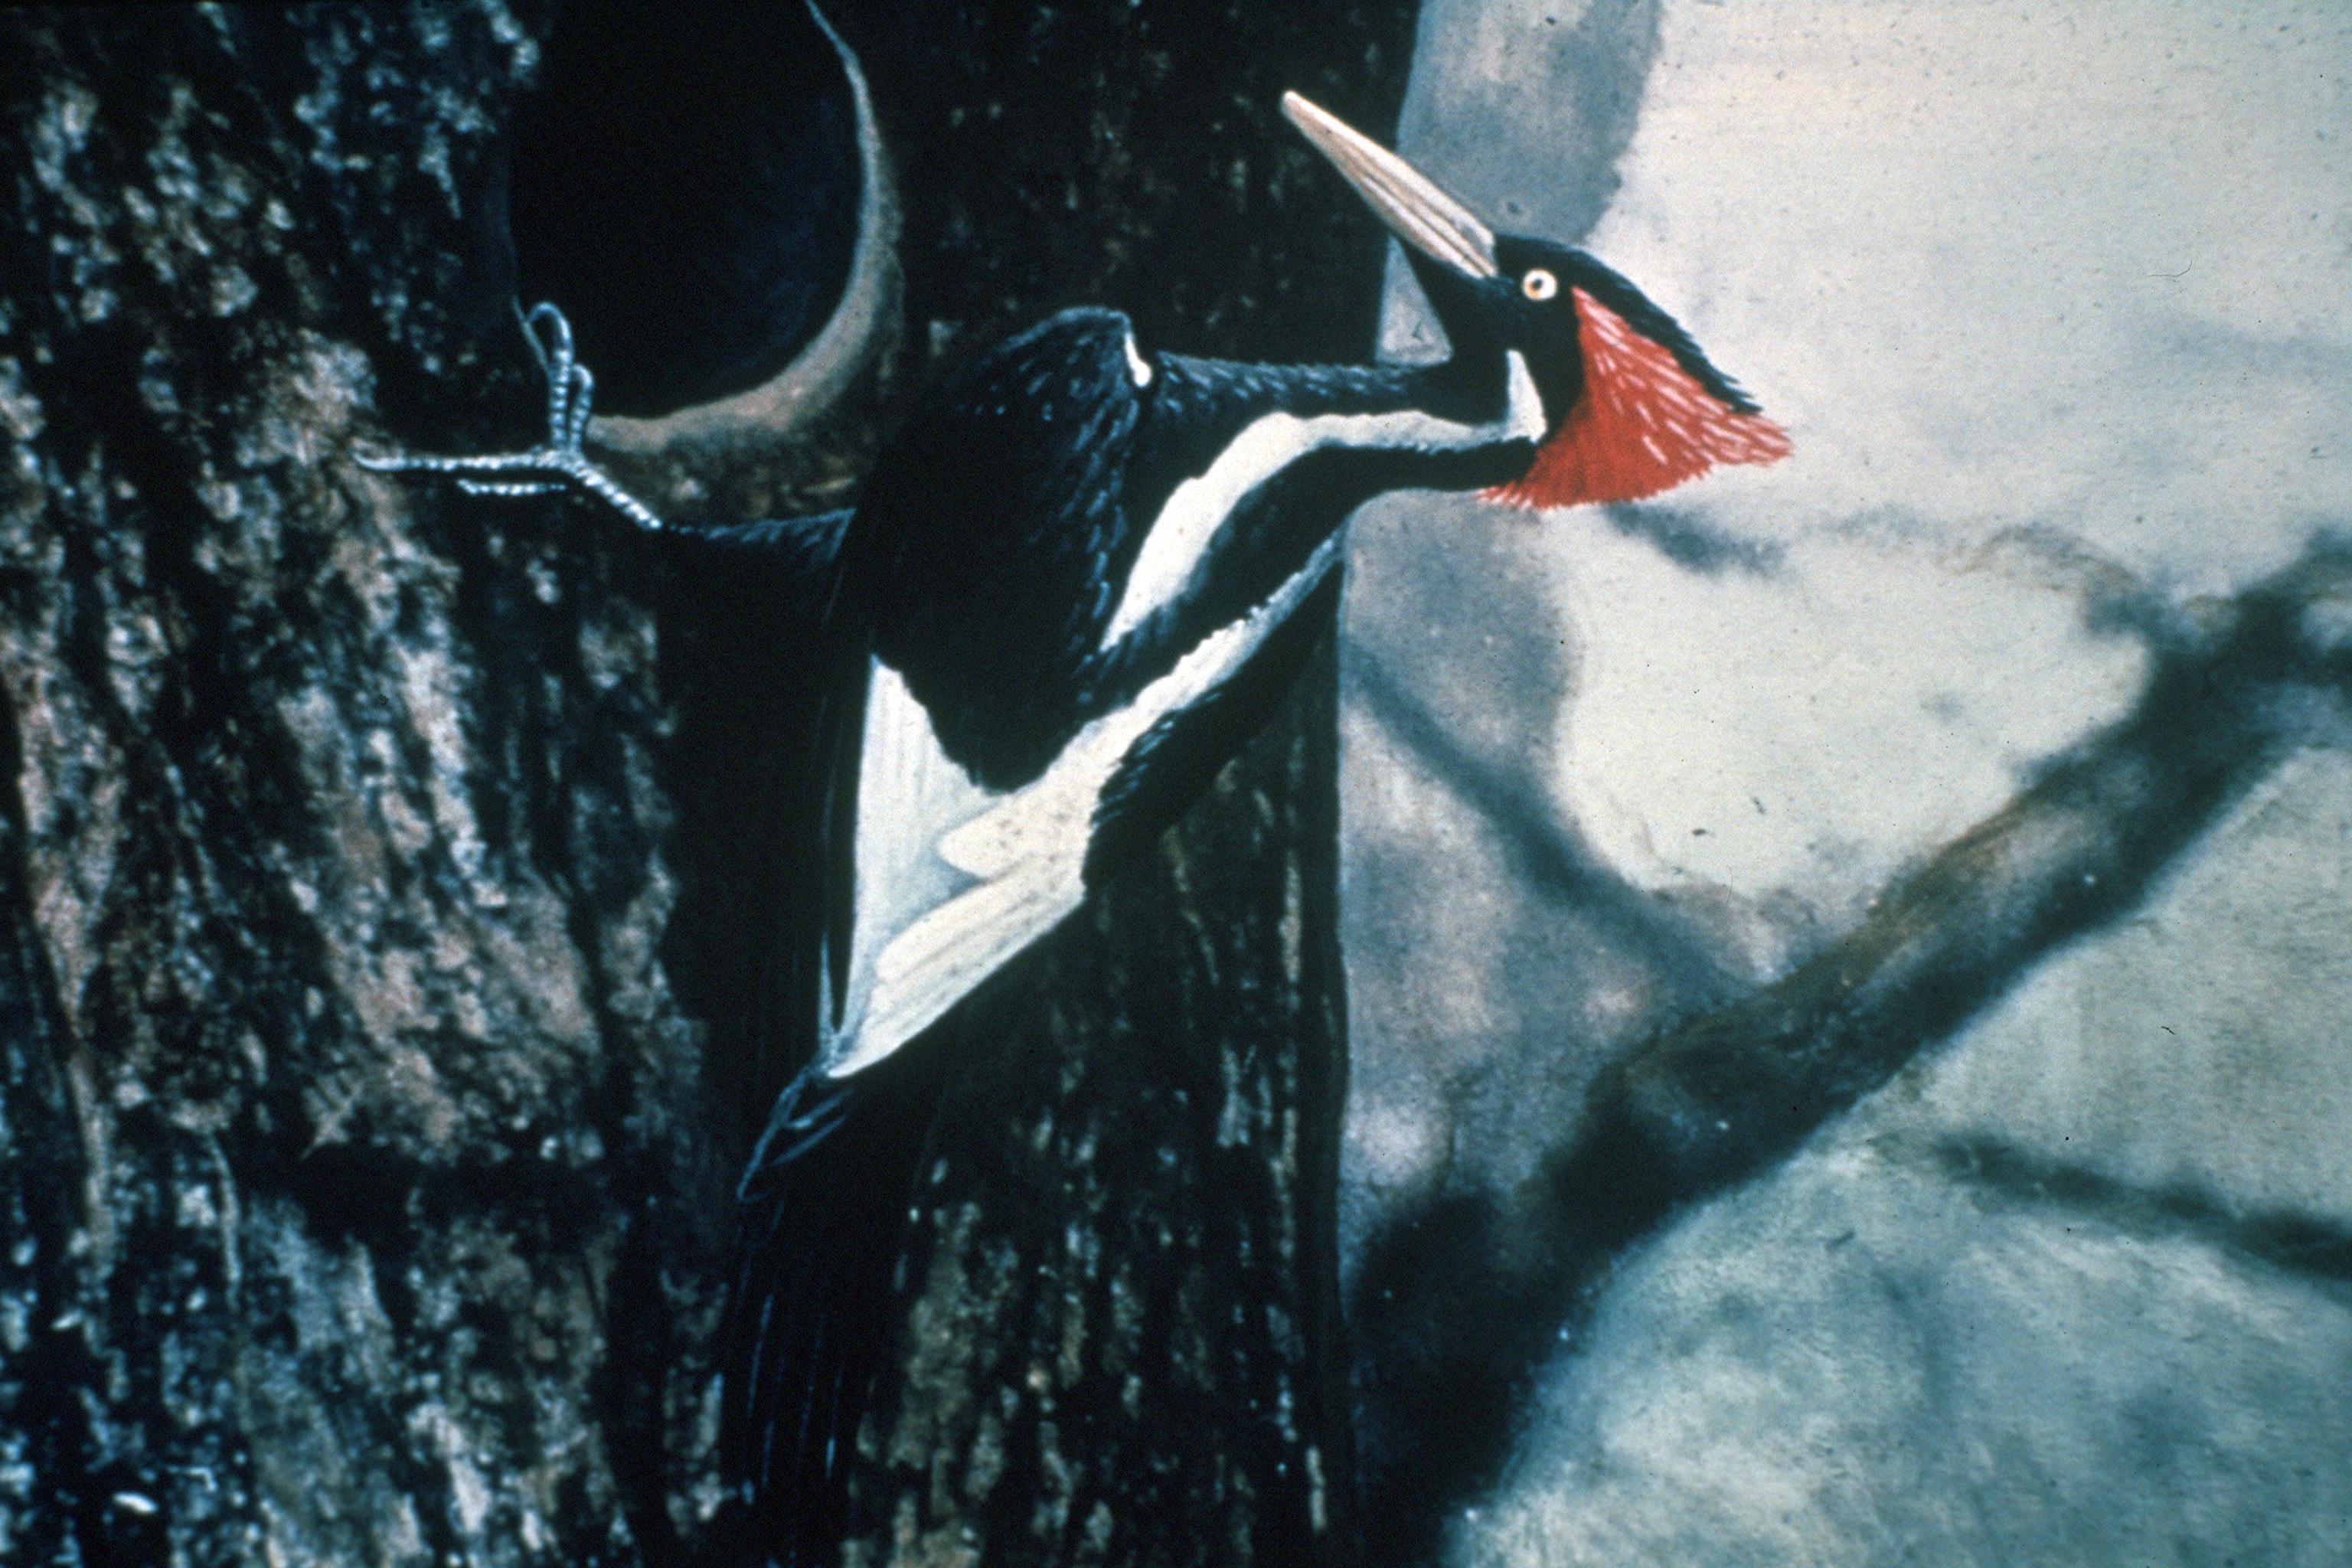 23 Species Declared Extinct in the United States